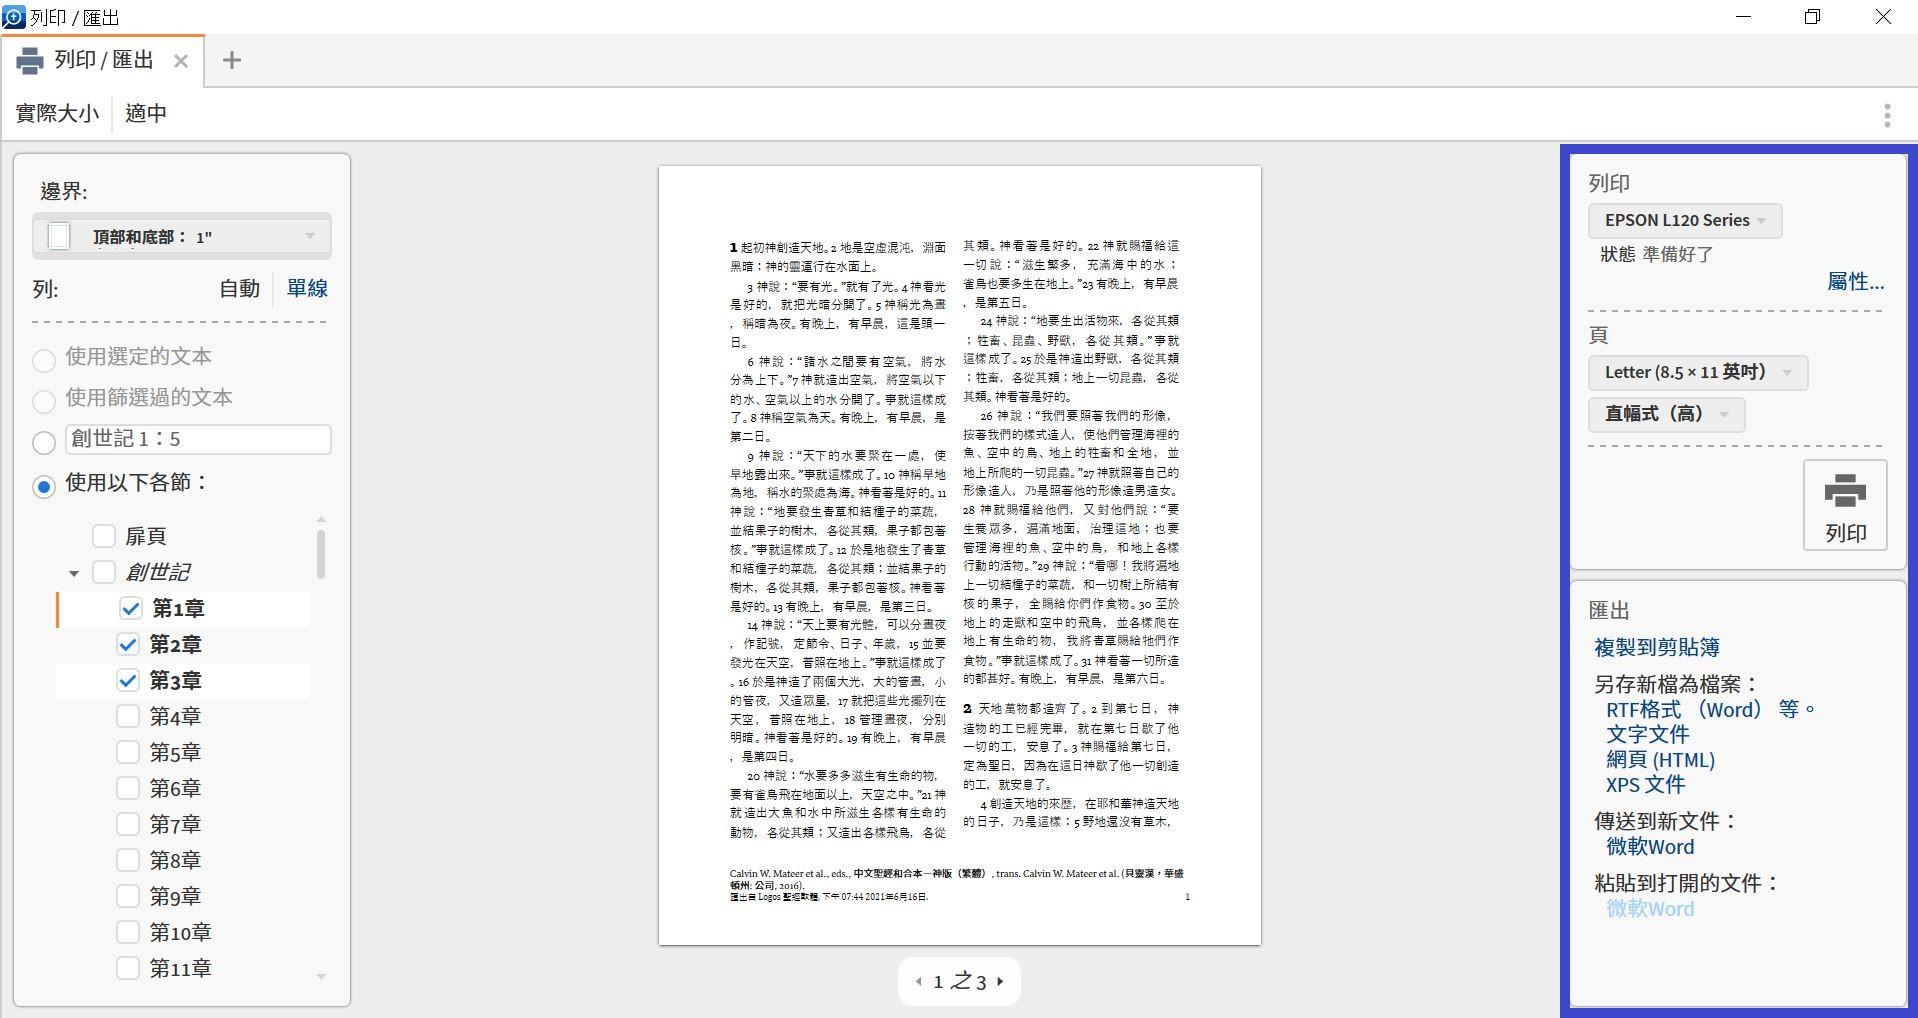 Screen_Shot_2019-09-17_at_1.11.55_PM_copy_3.png